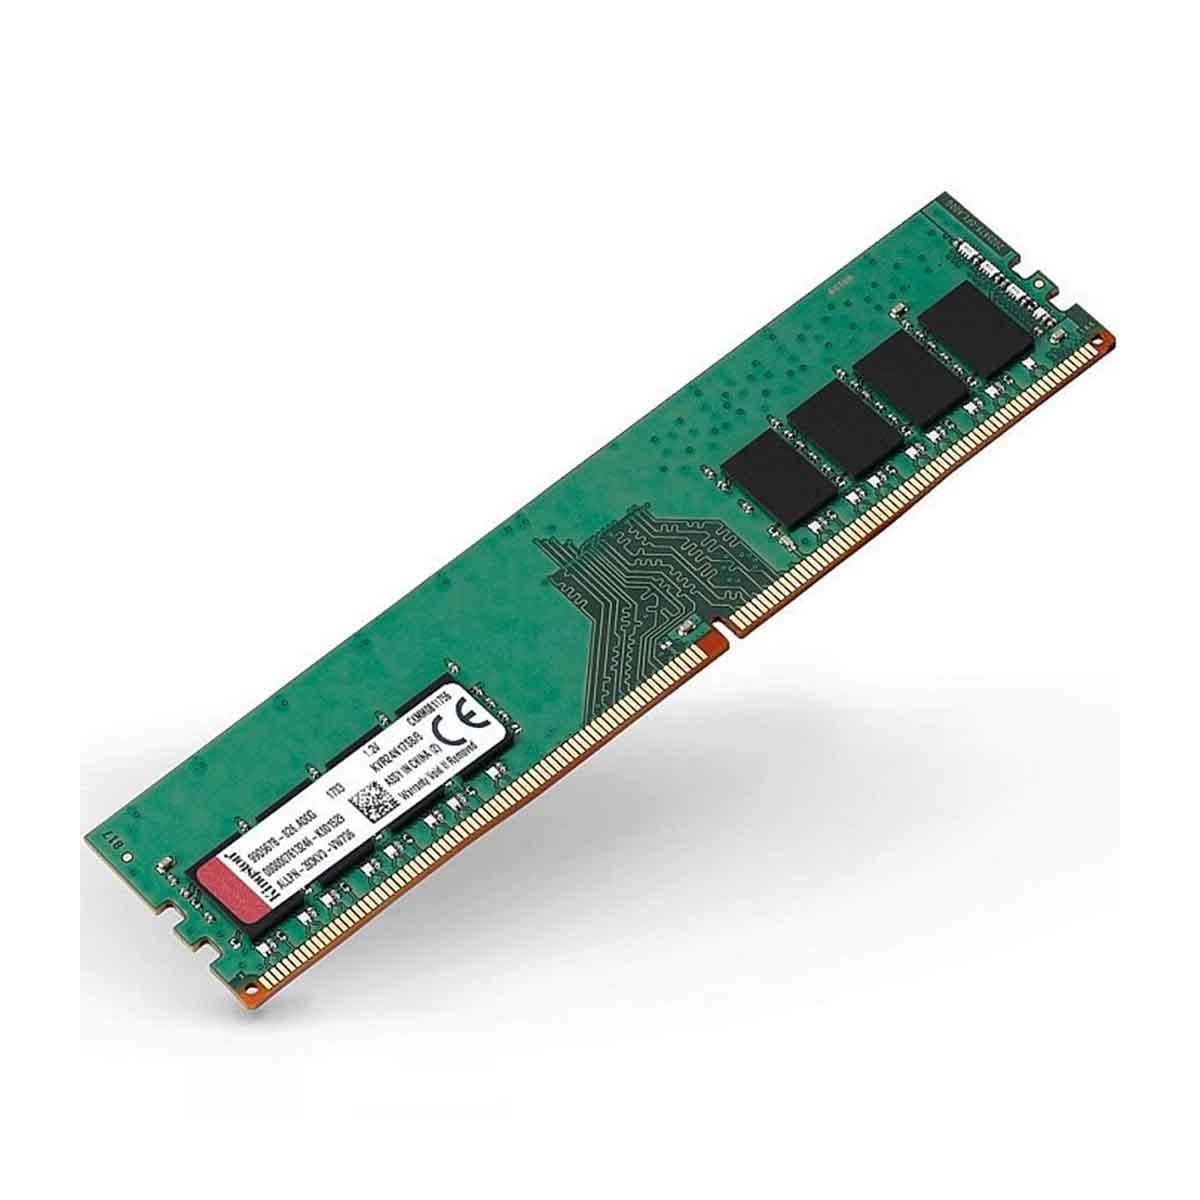 MEMORIA KINGSTON 8GB 2400 -DDR4 SDRAM KVR24N17S8/8